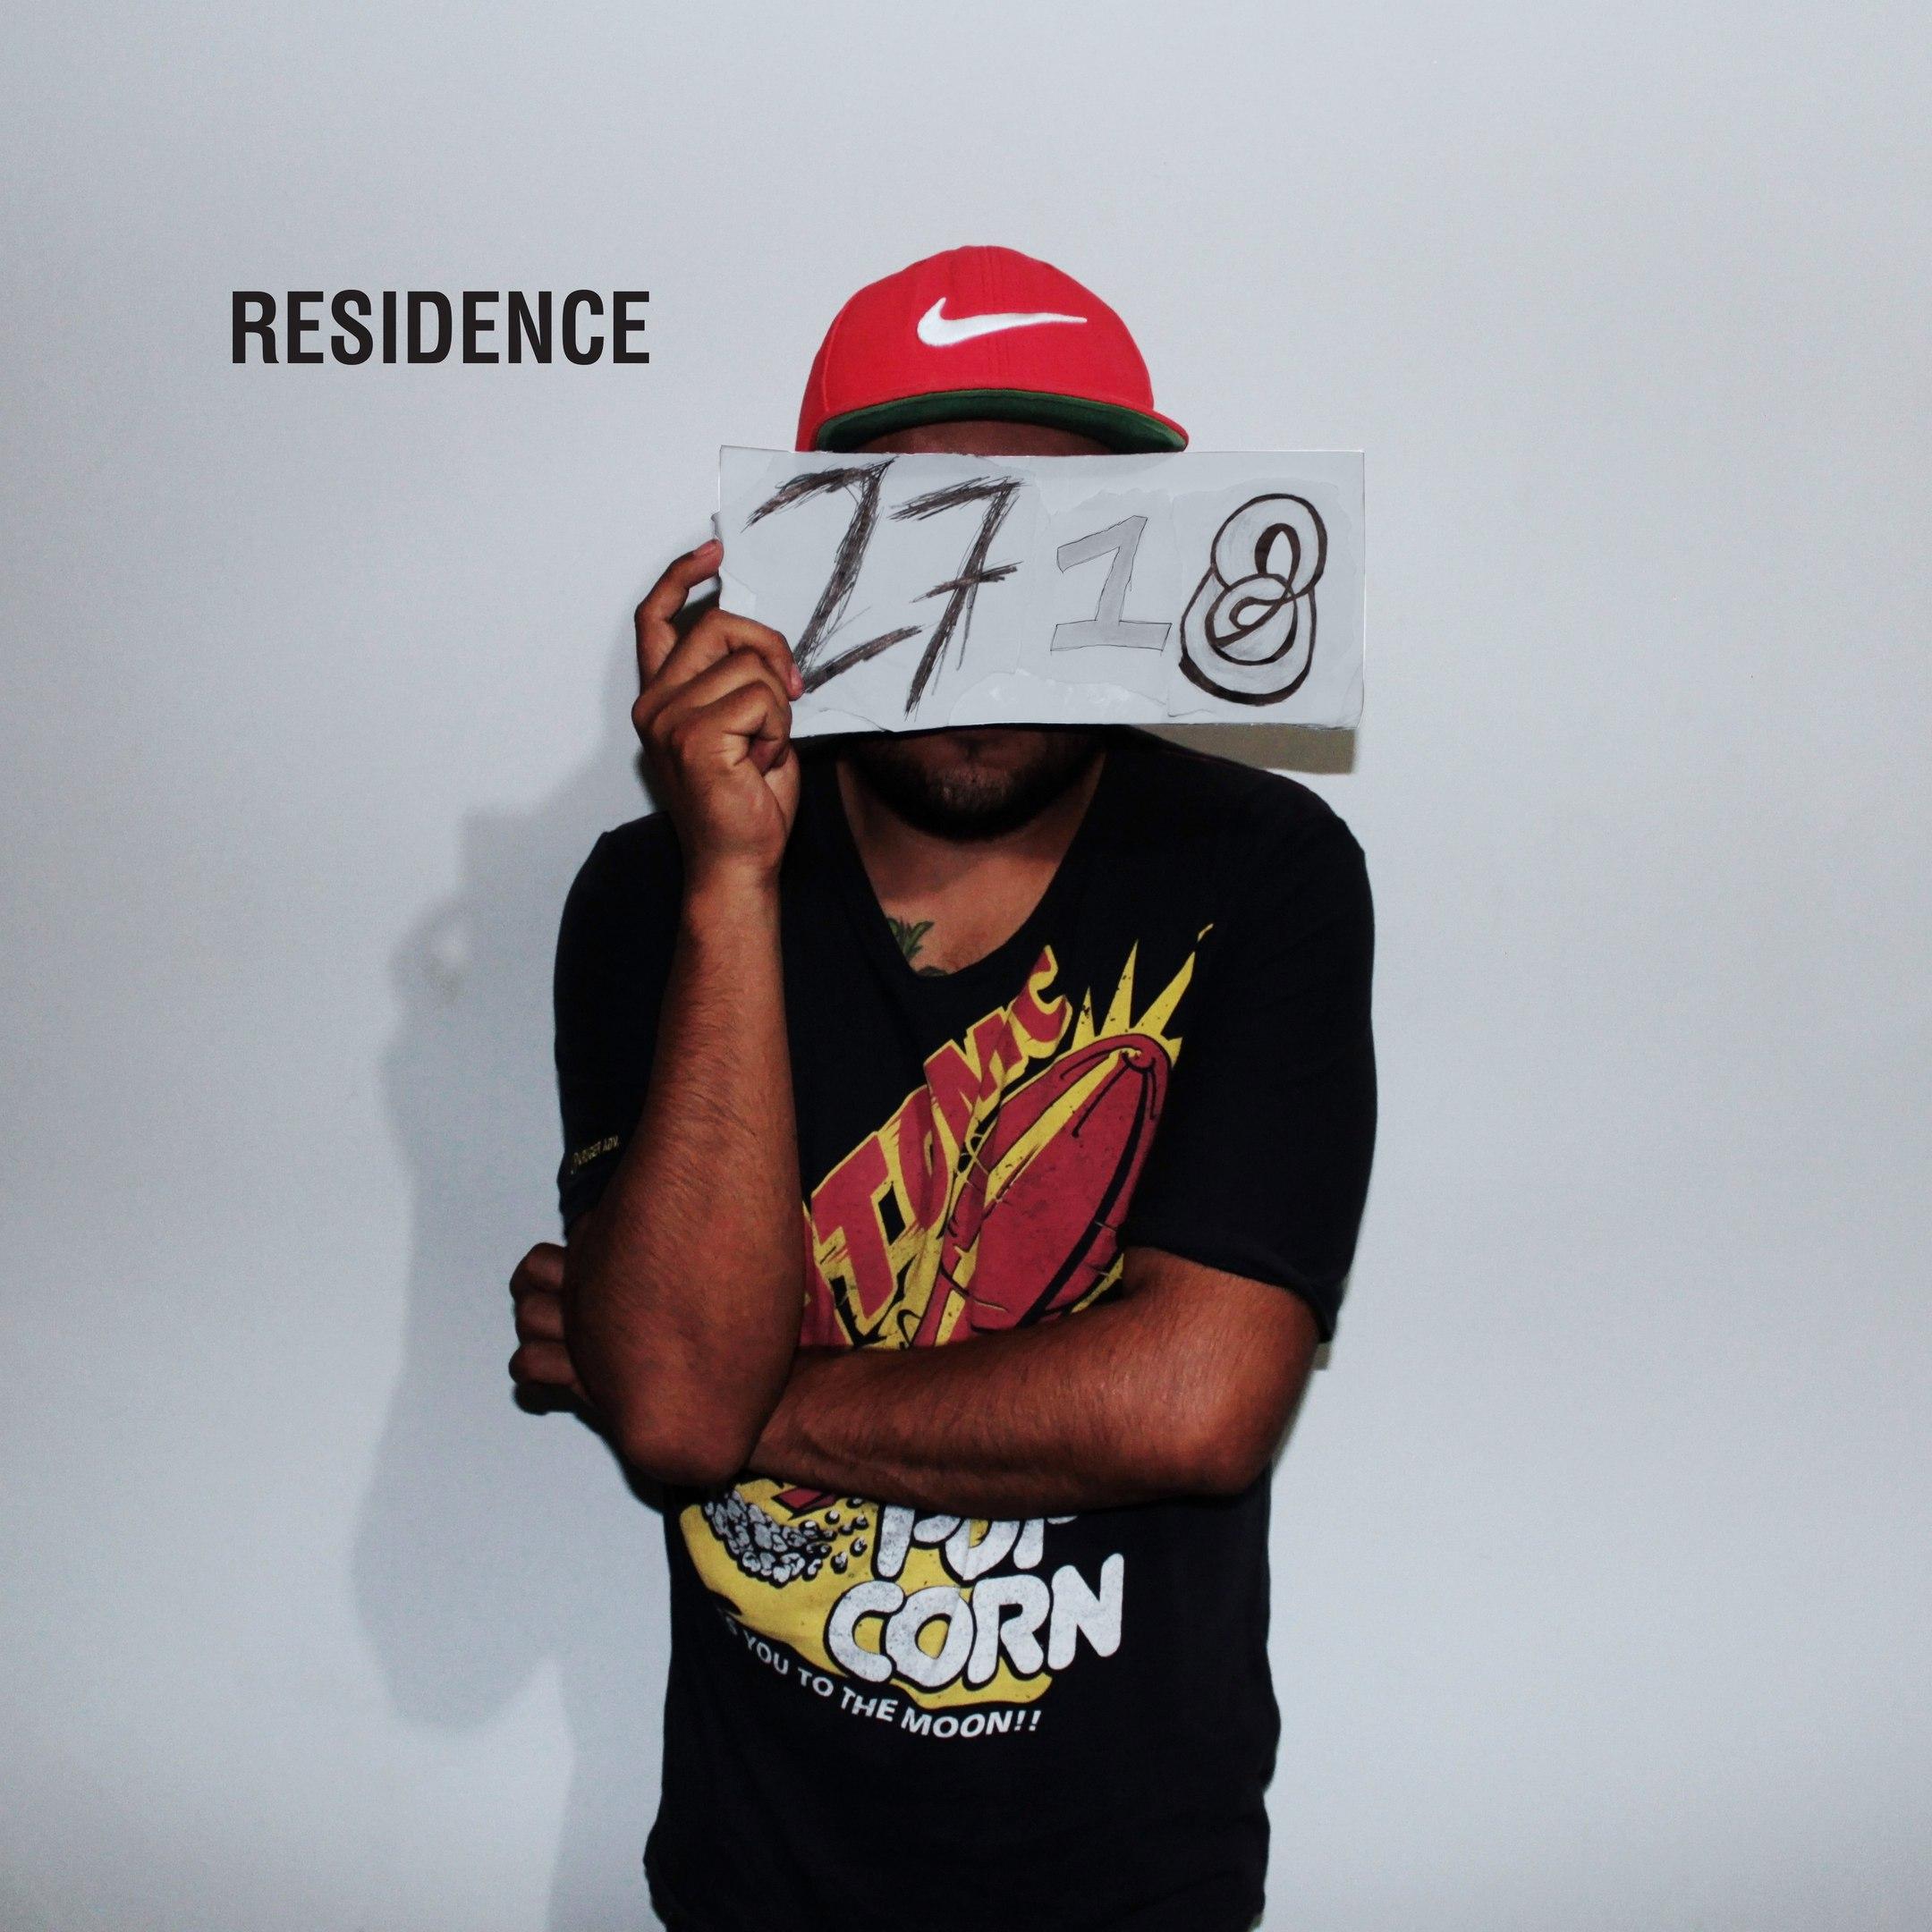 Residence - 2718 [single] (2018)